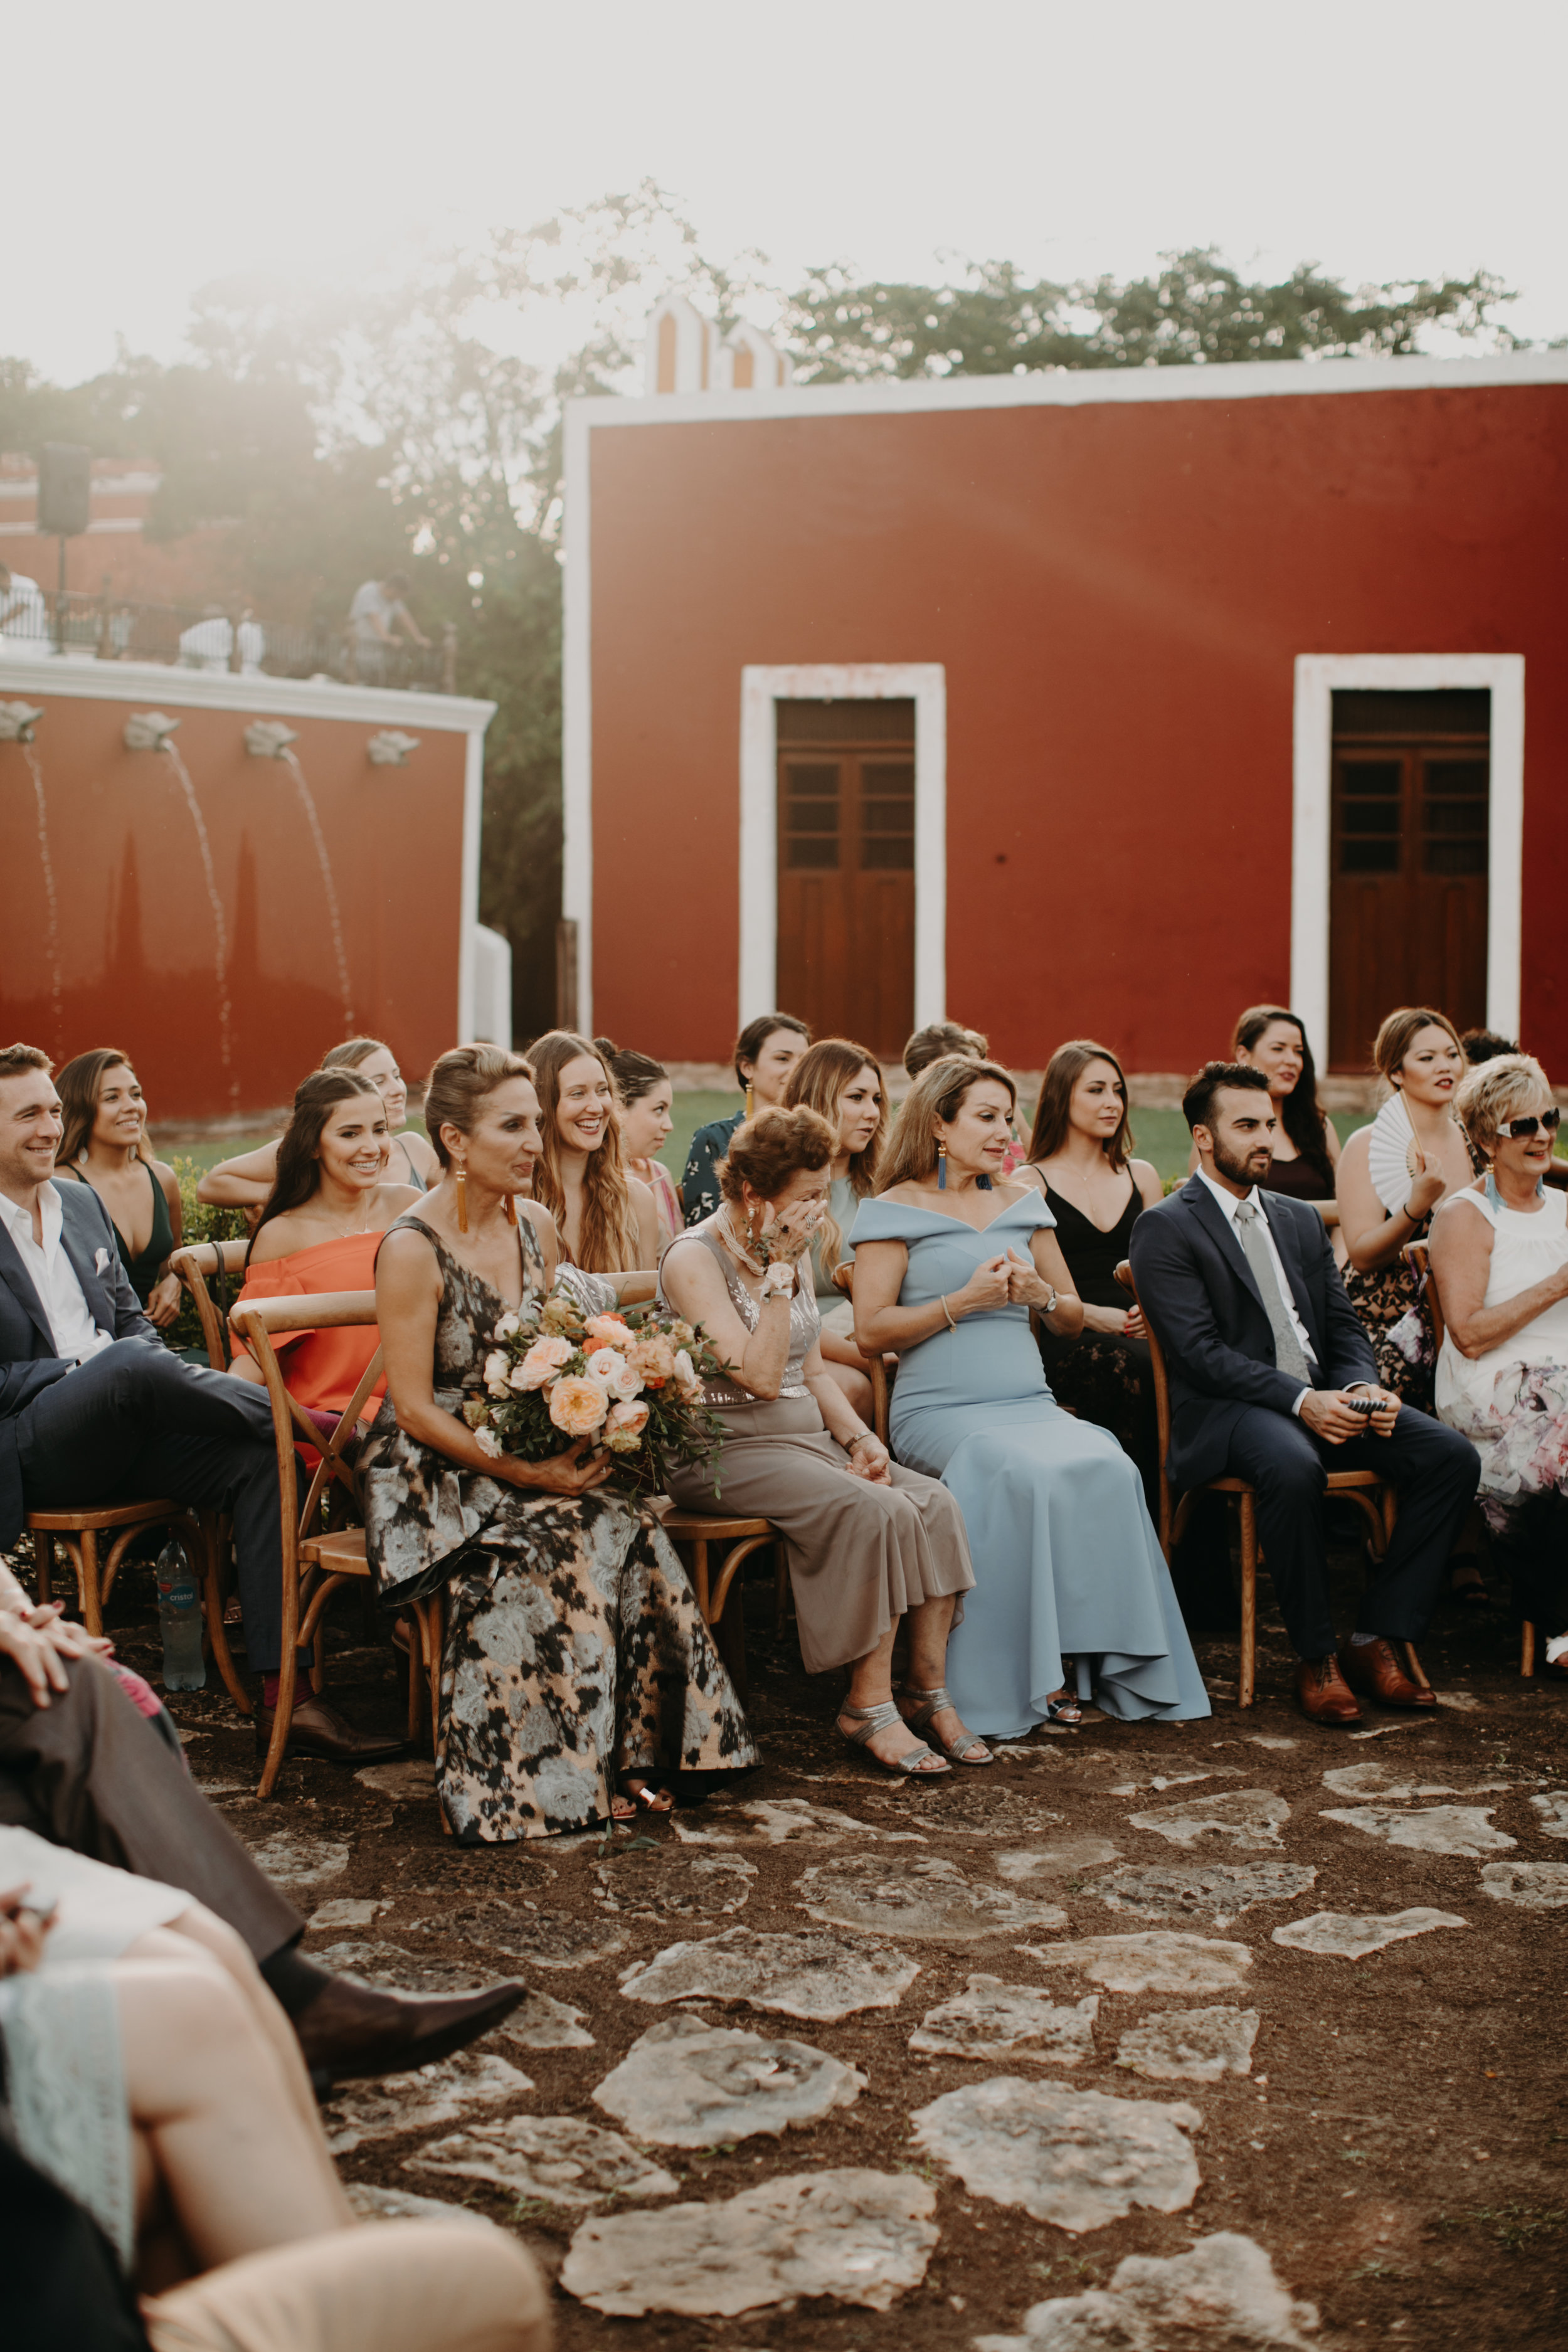 Hacienda Temozon Yucatan Mexico Wedding | Ida & Peter Emily Magers Photography-1021.jpg